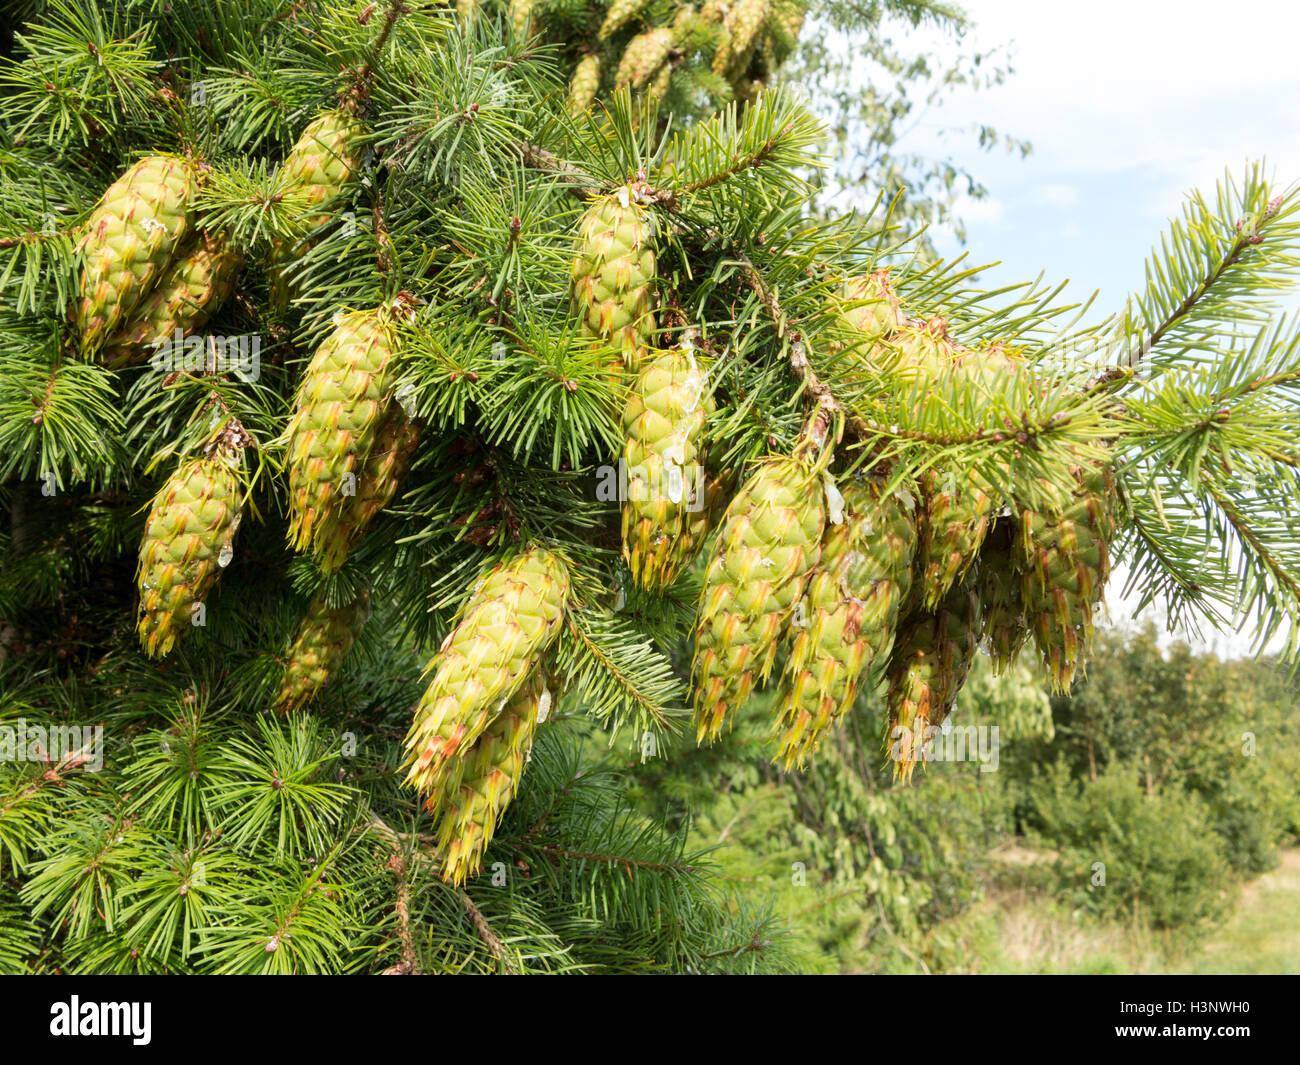 Evergreen Conifer Stockfotos & Evergreen Conifer Bilder - Alamy